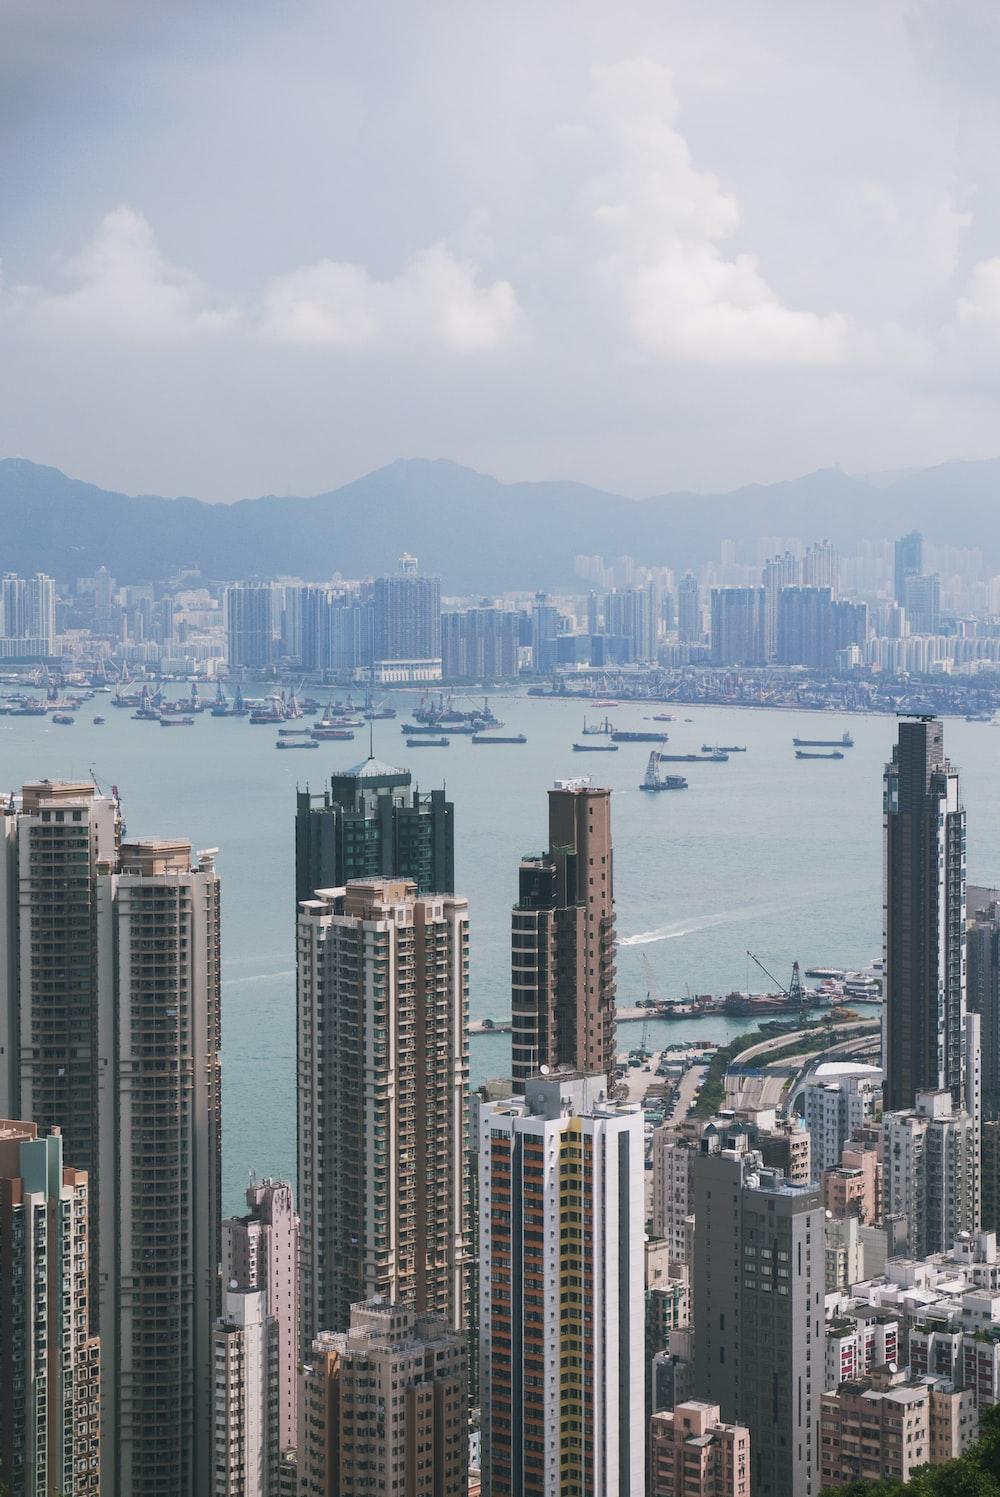 bird's eye view photo of urban place